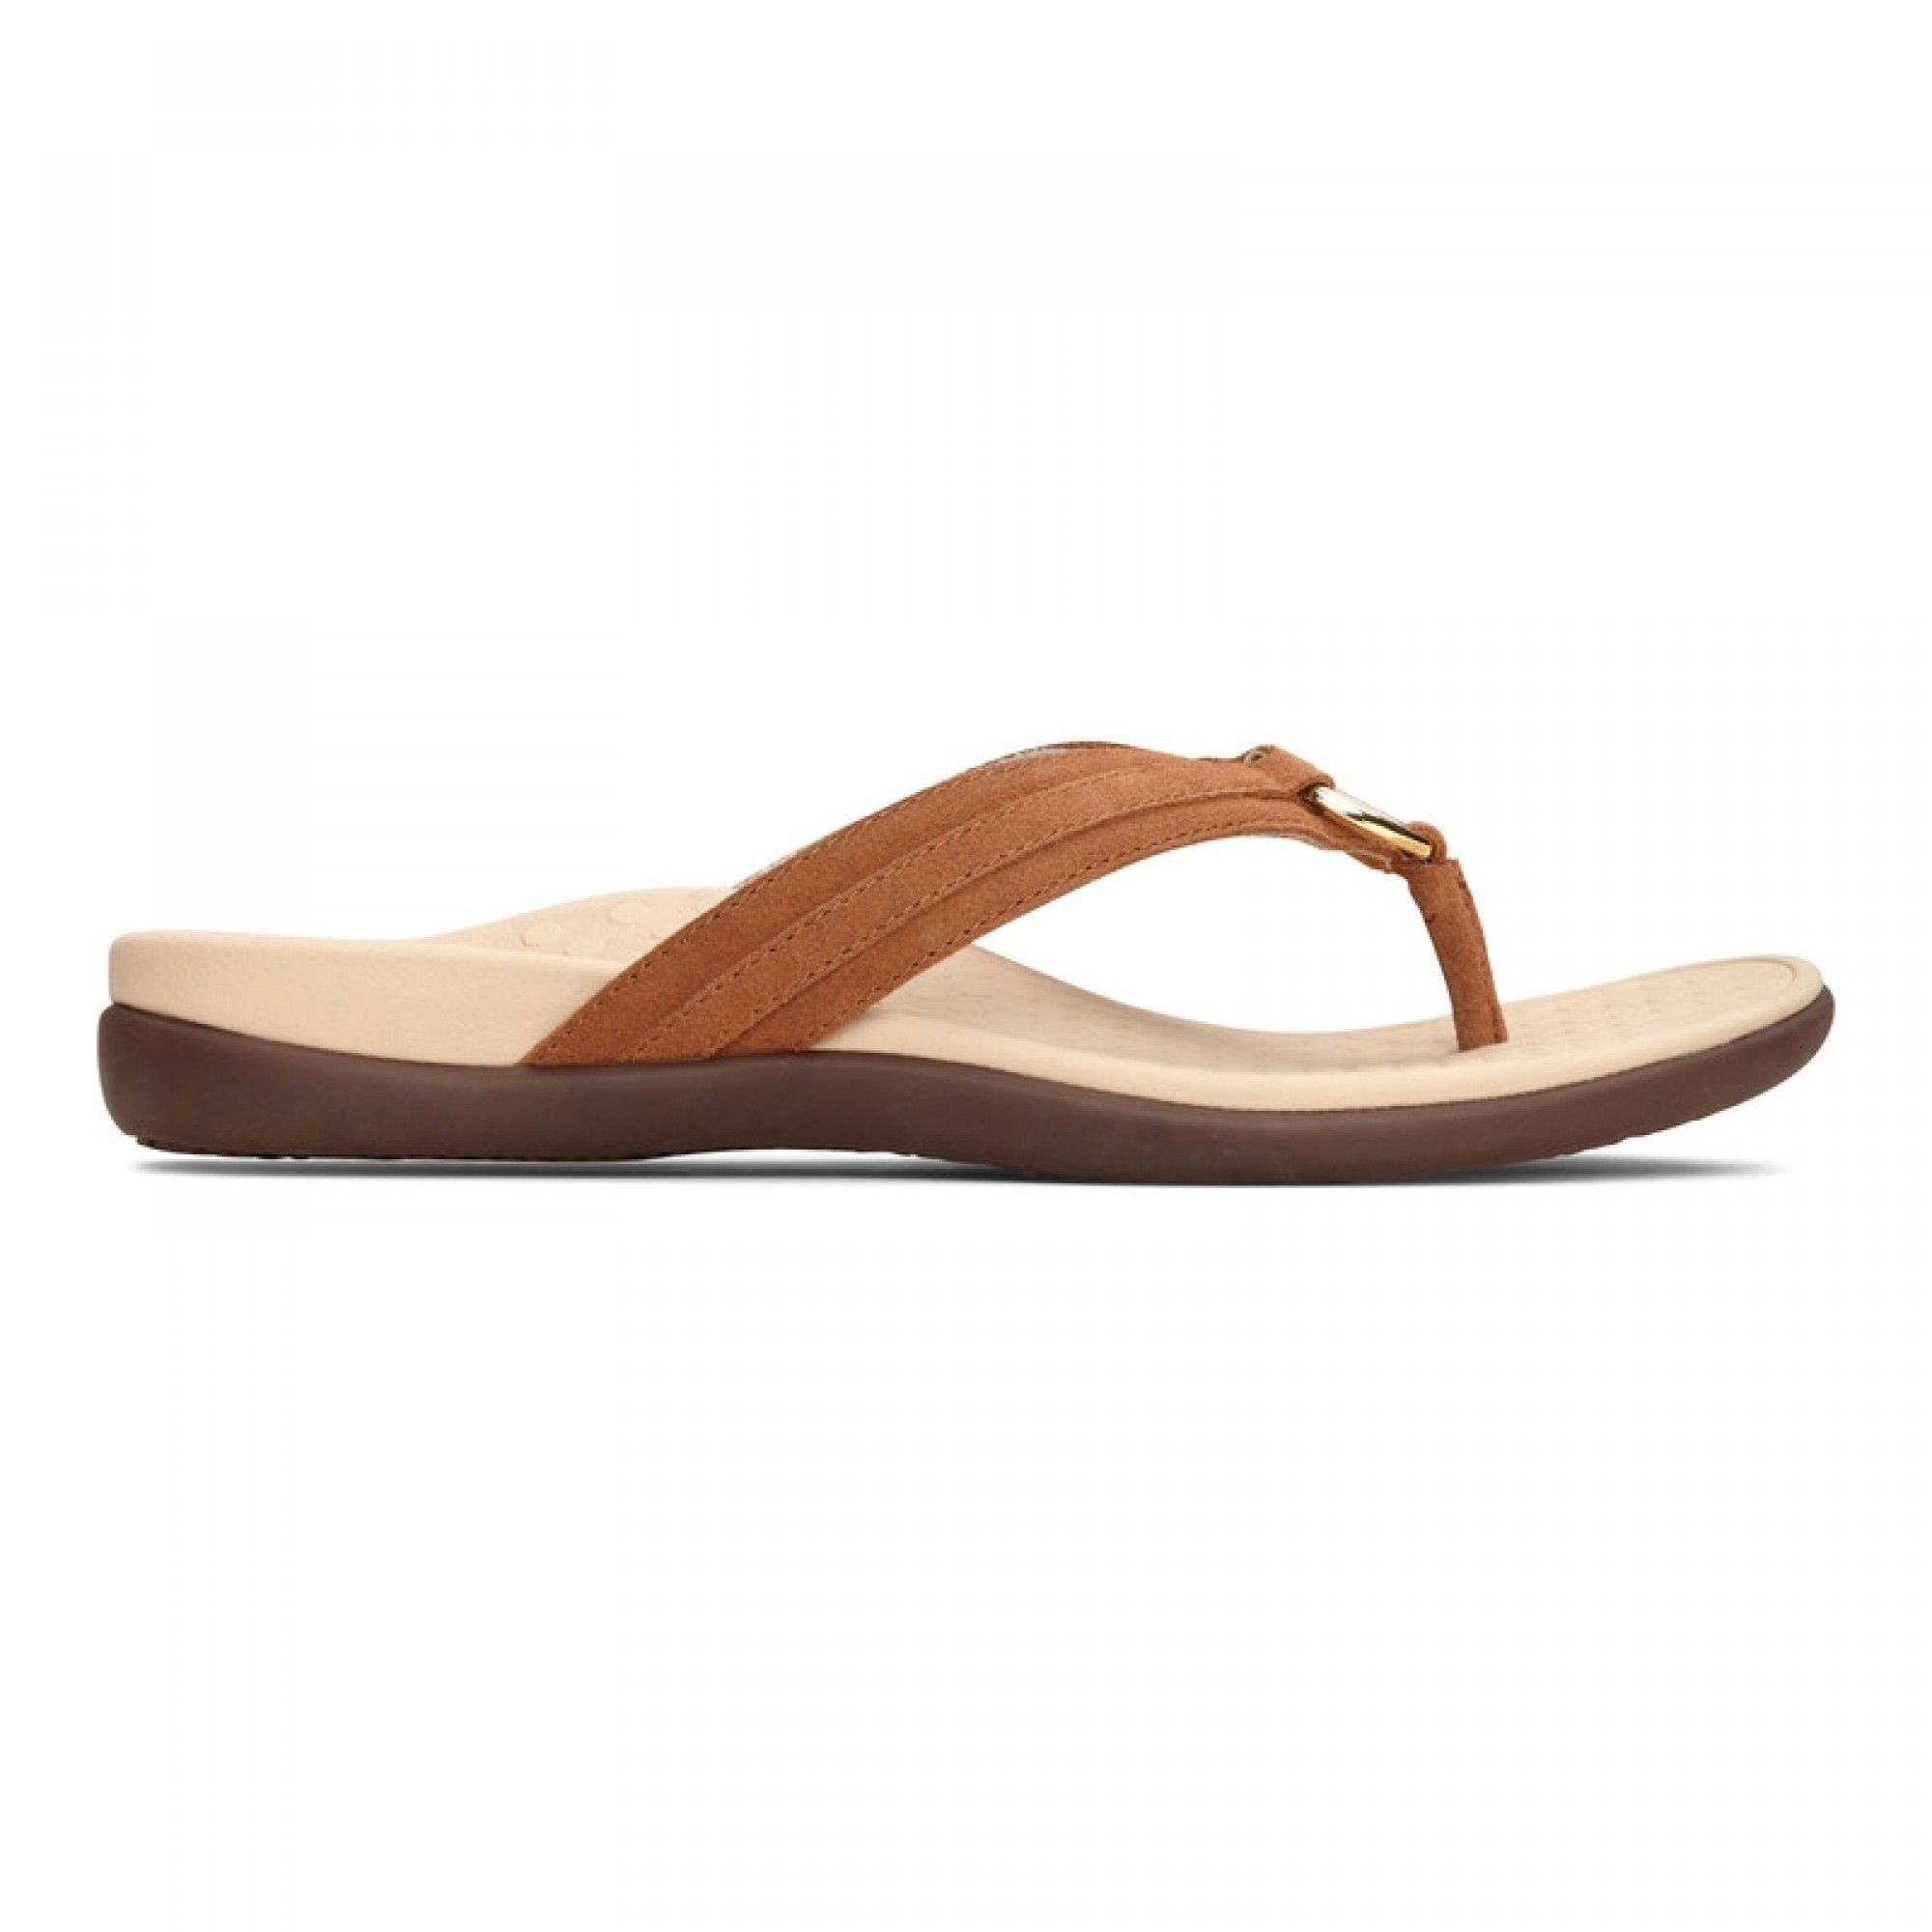 Vionic Tide Aloe Toe Post Sandal - Women's